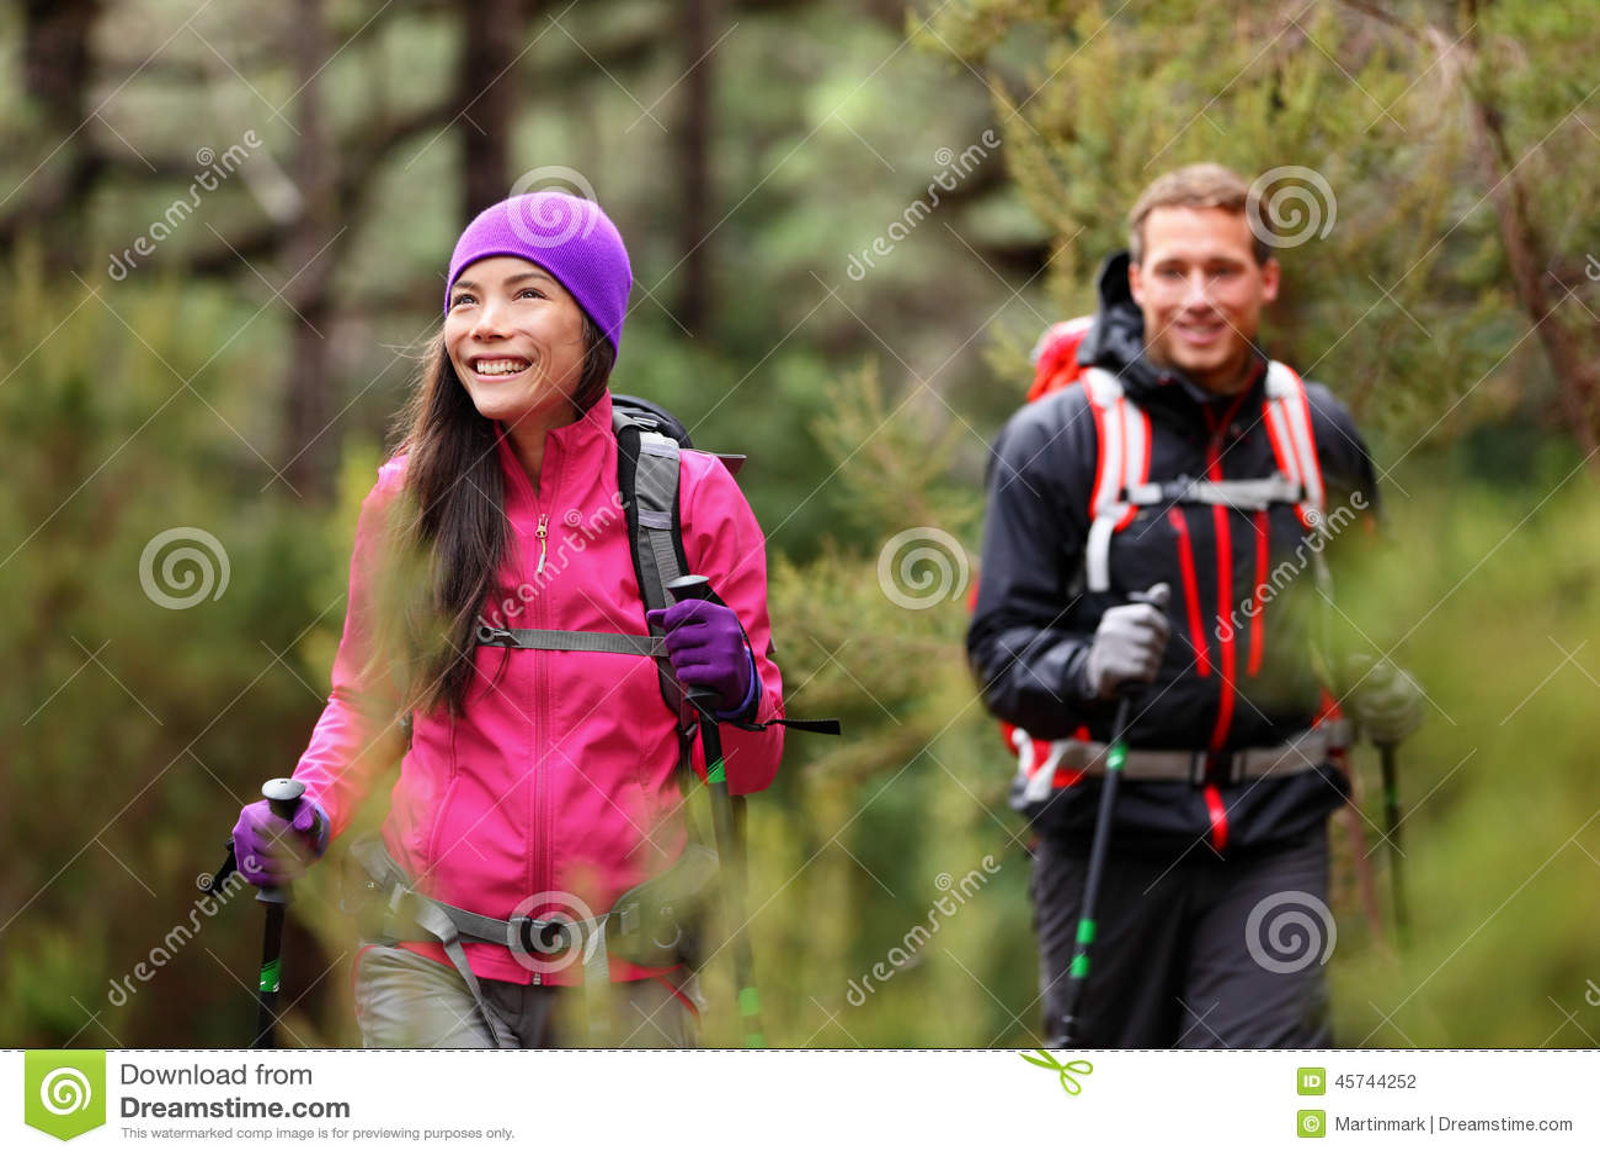 Пешие люди - hikers trekking в лесе на походе